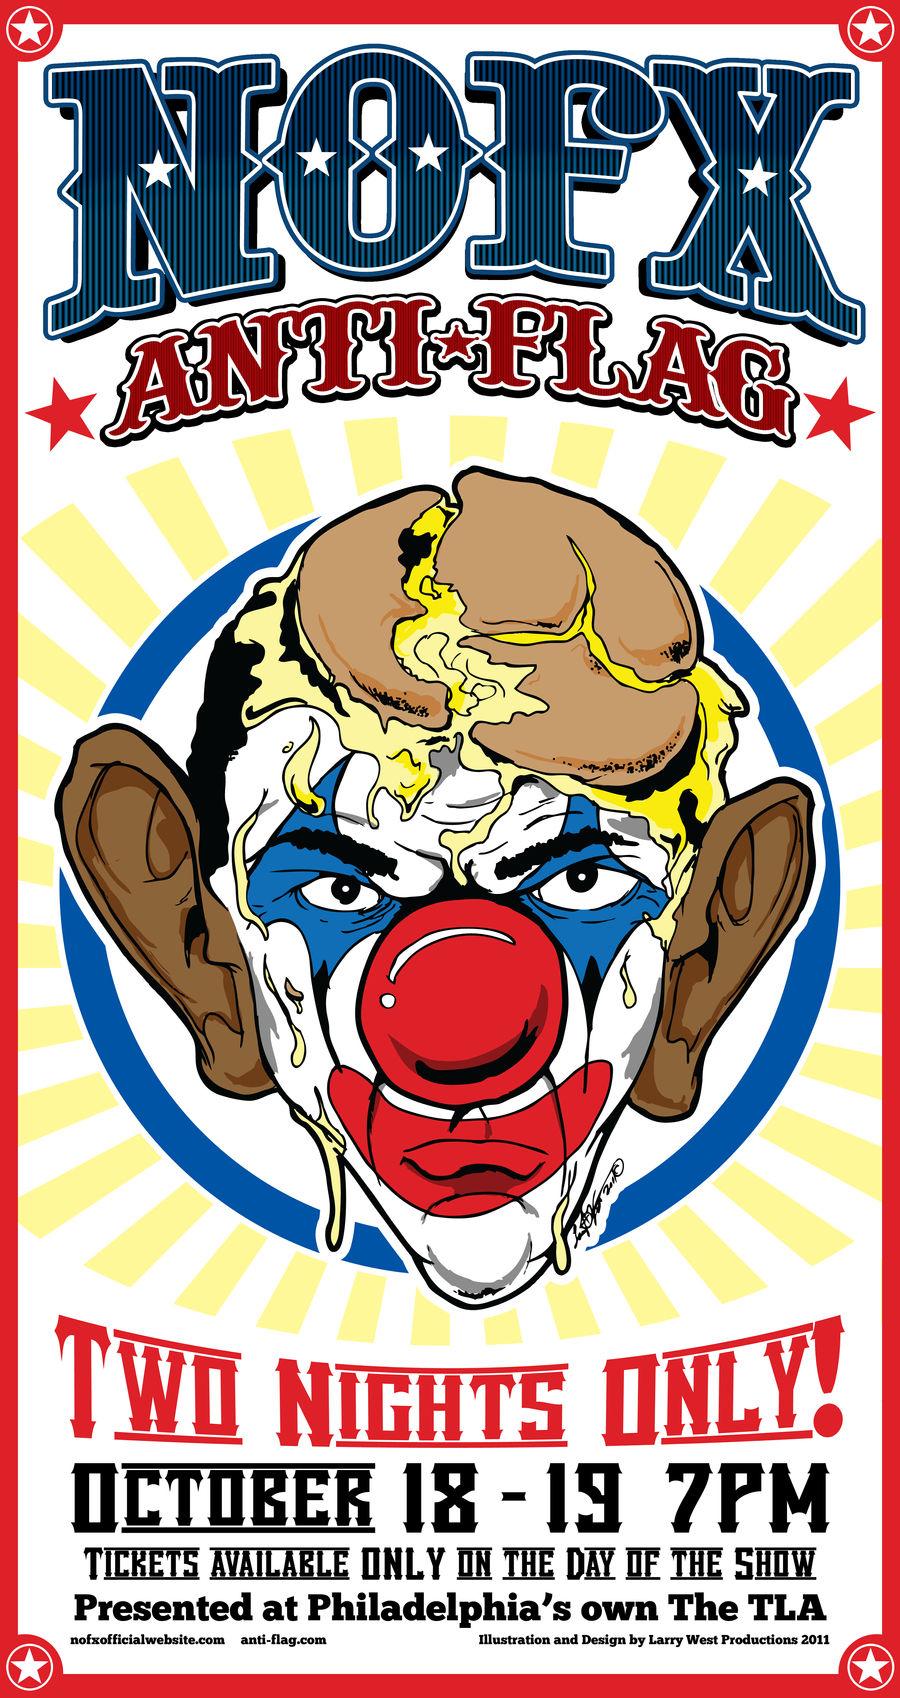 NOFX 'Obama Clown' Poster